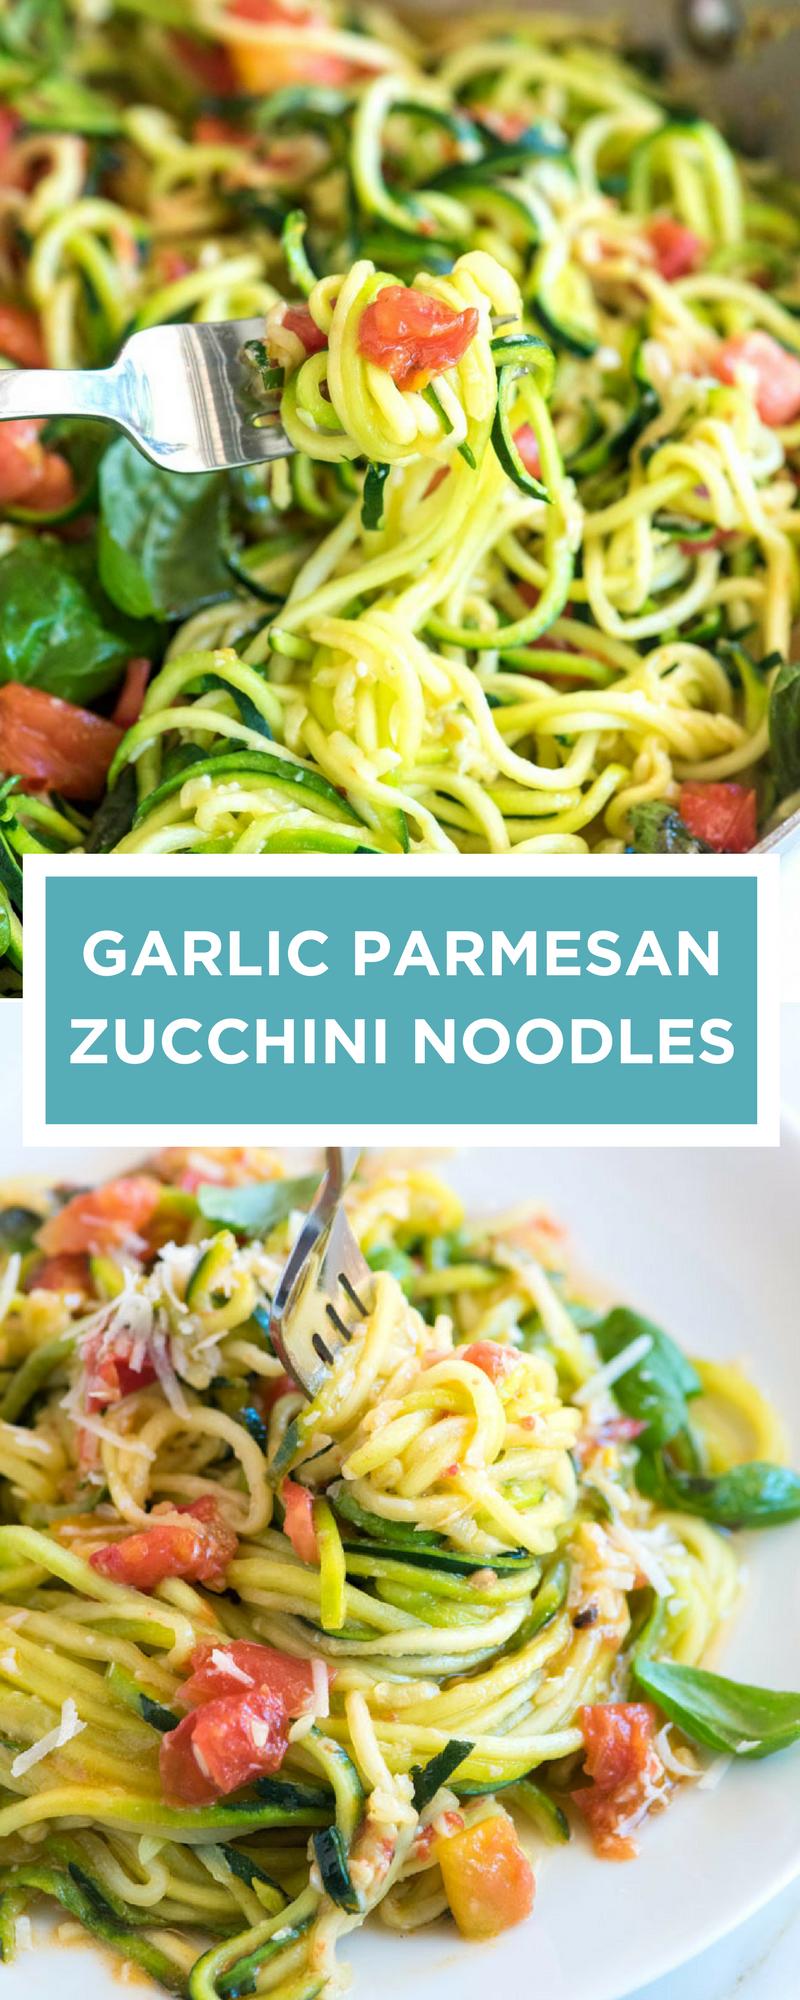 Photo of Guilt-Free Garlic Parmesan Zucchini Noodles Pasta